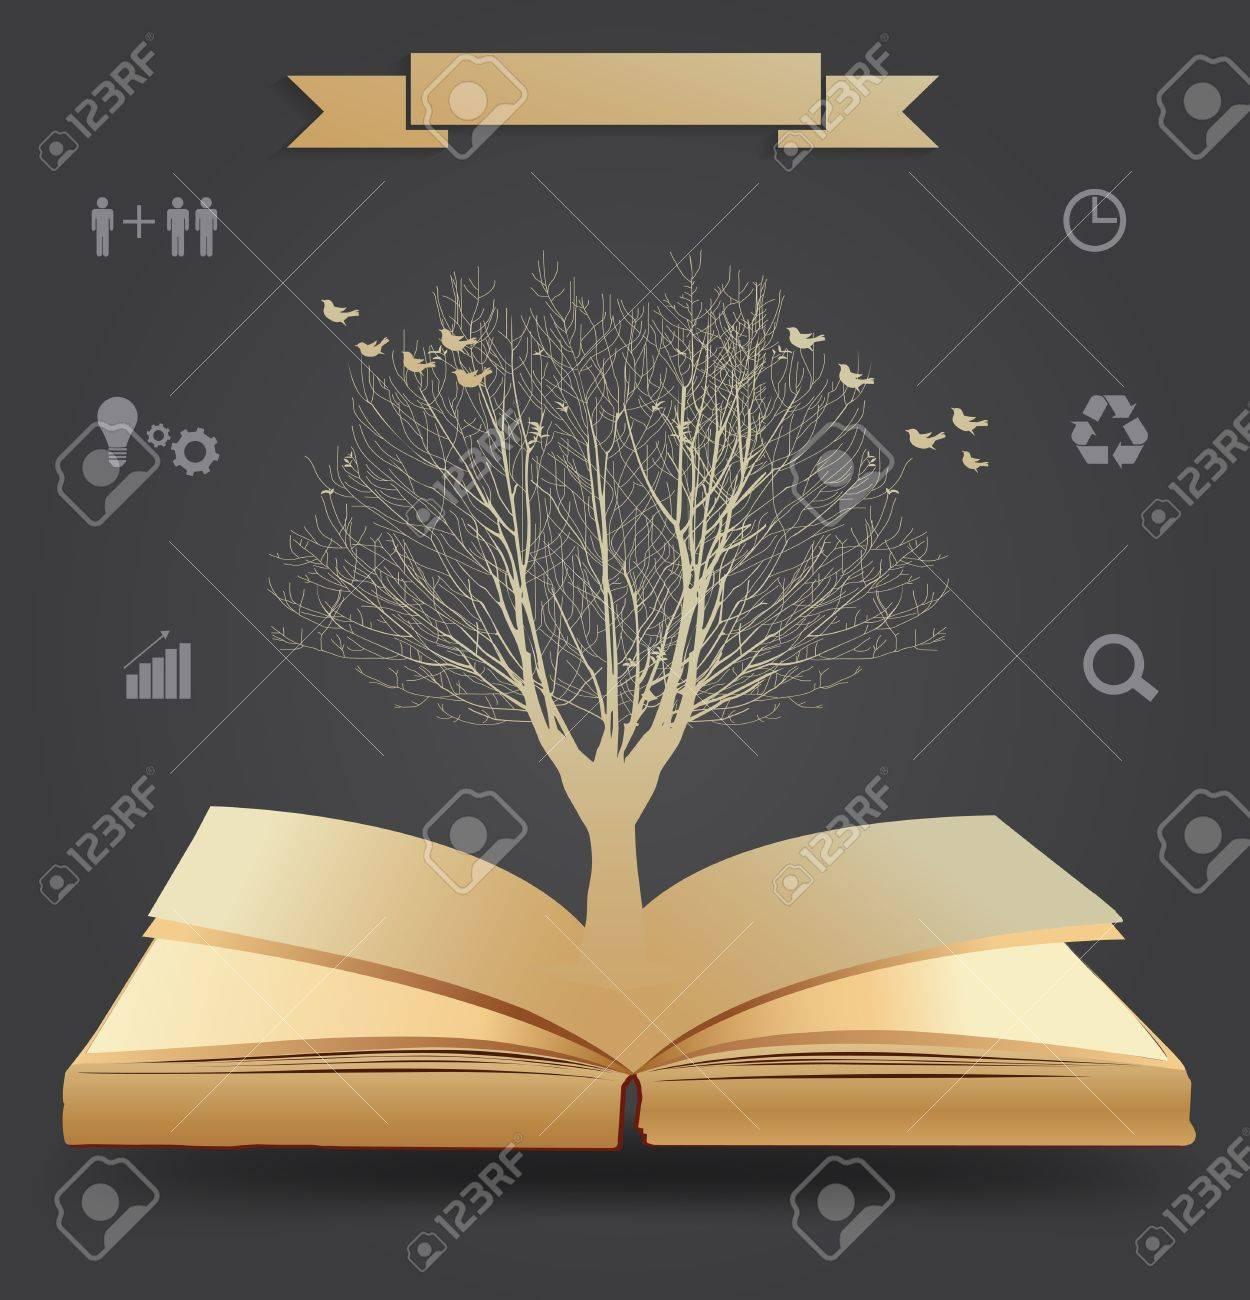 Tree silhouette on book, illustration modern template design Stock Vector - 21130146